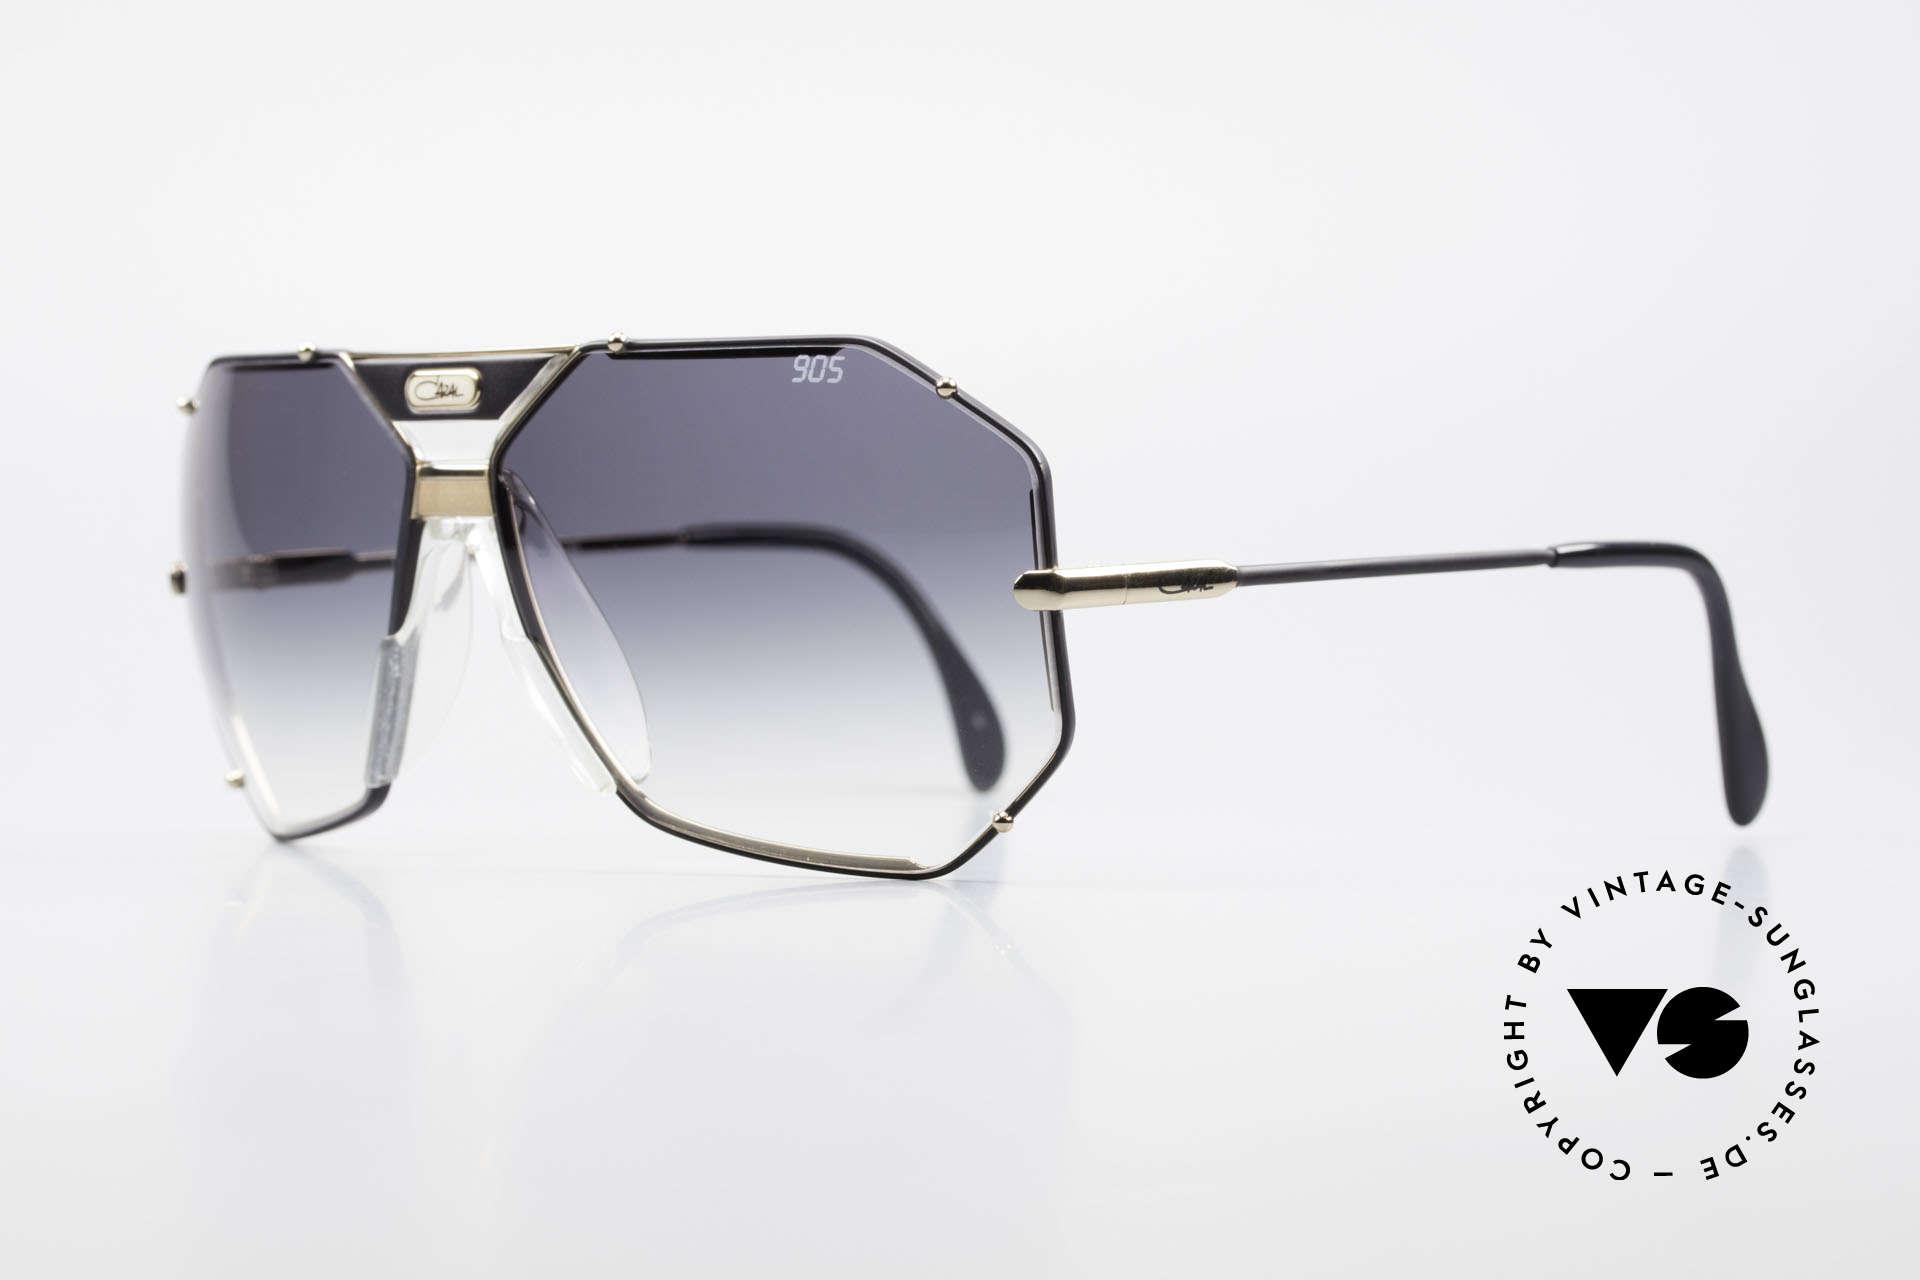 Cazal 905 Original 90's Cazal Model 905, comes with original Cazal case and extra lenses, Made for Men